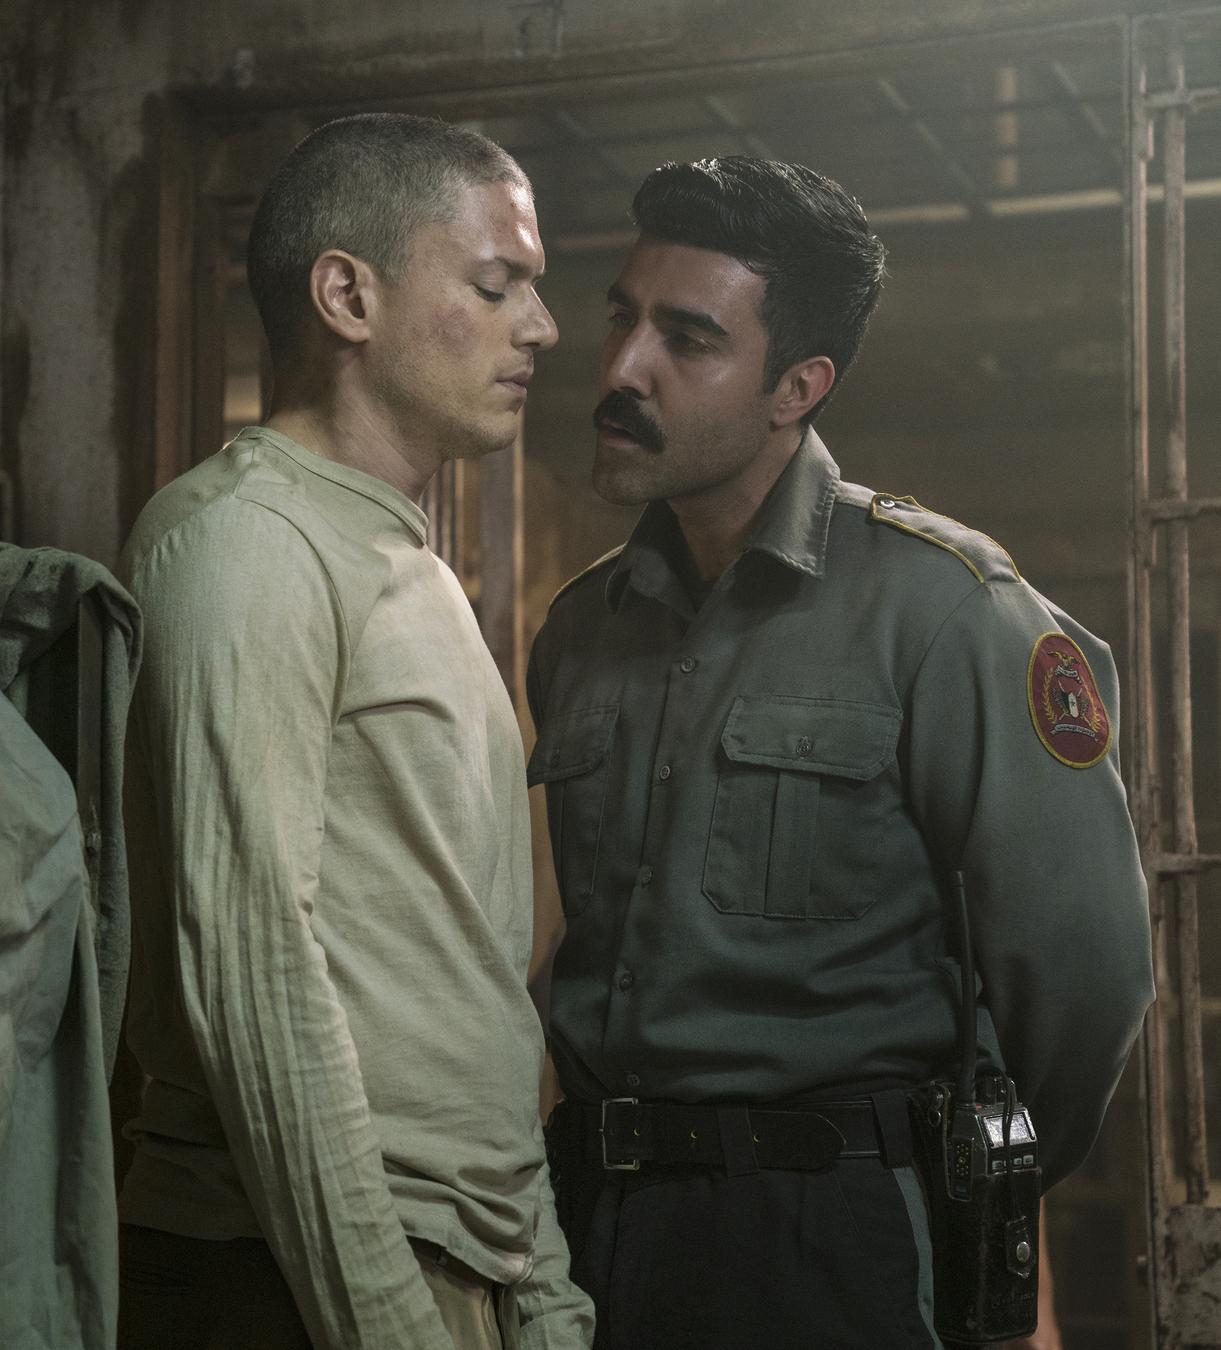 prison break season 5 full episodes free download